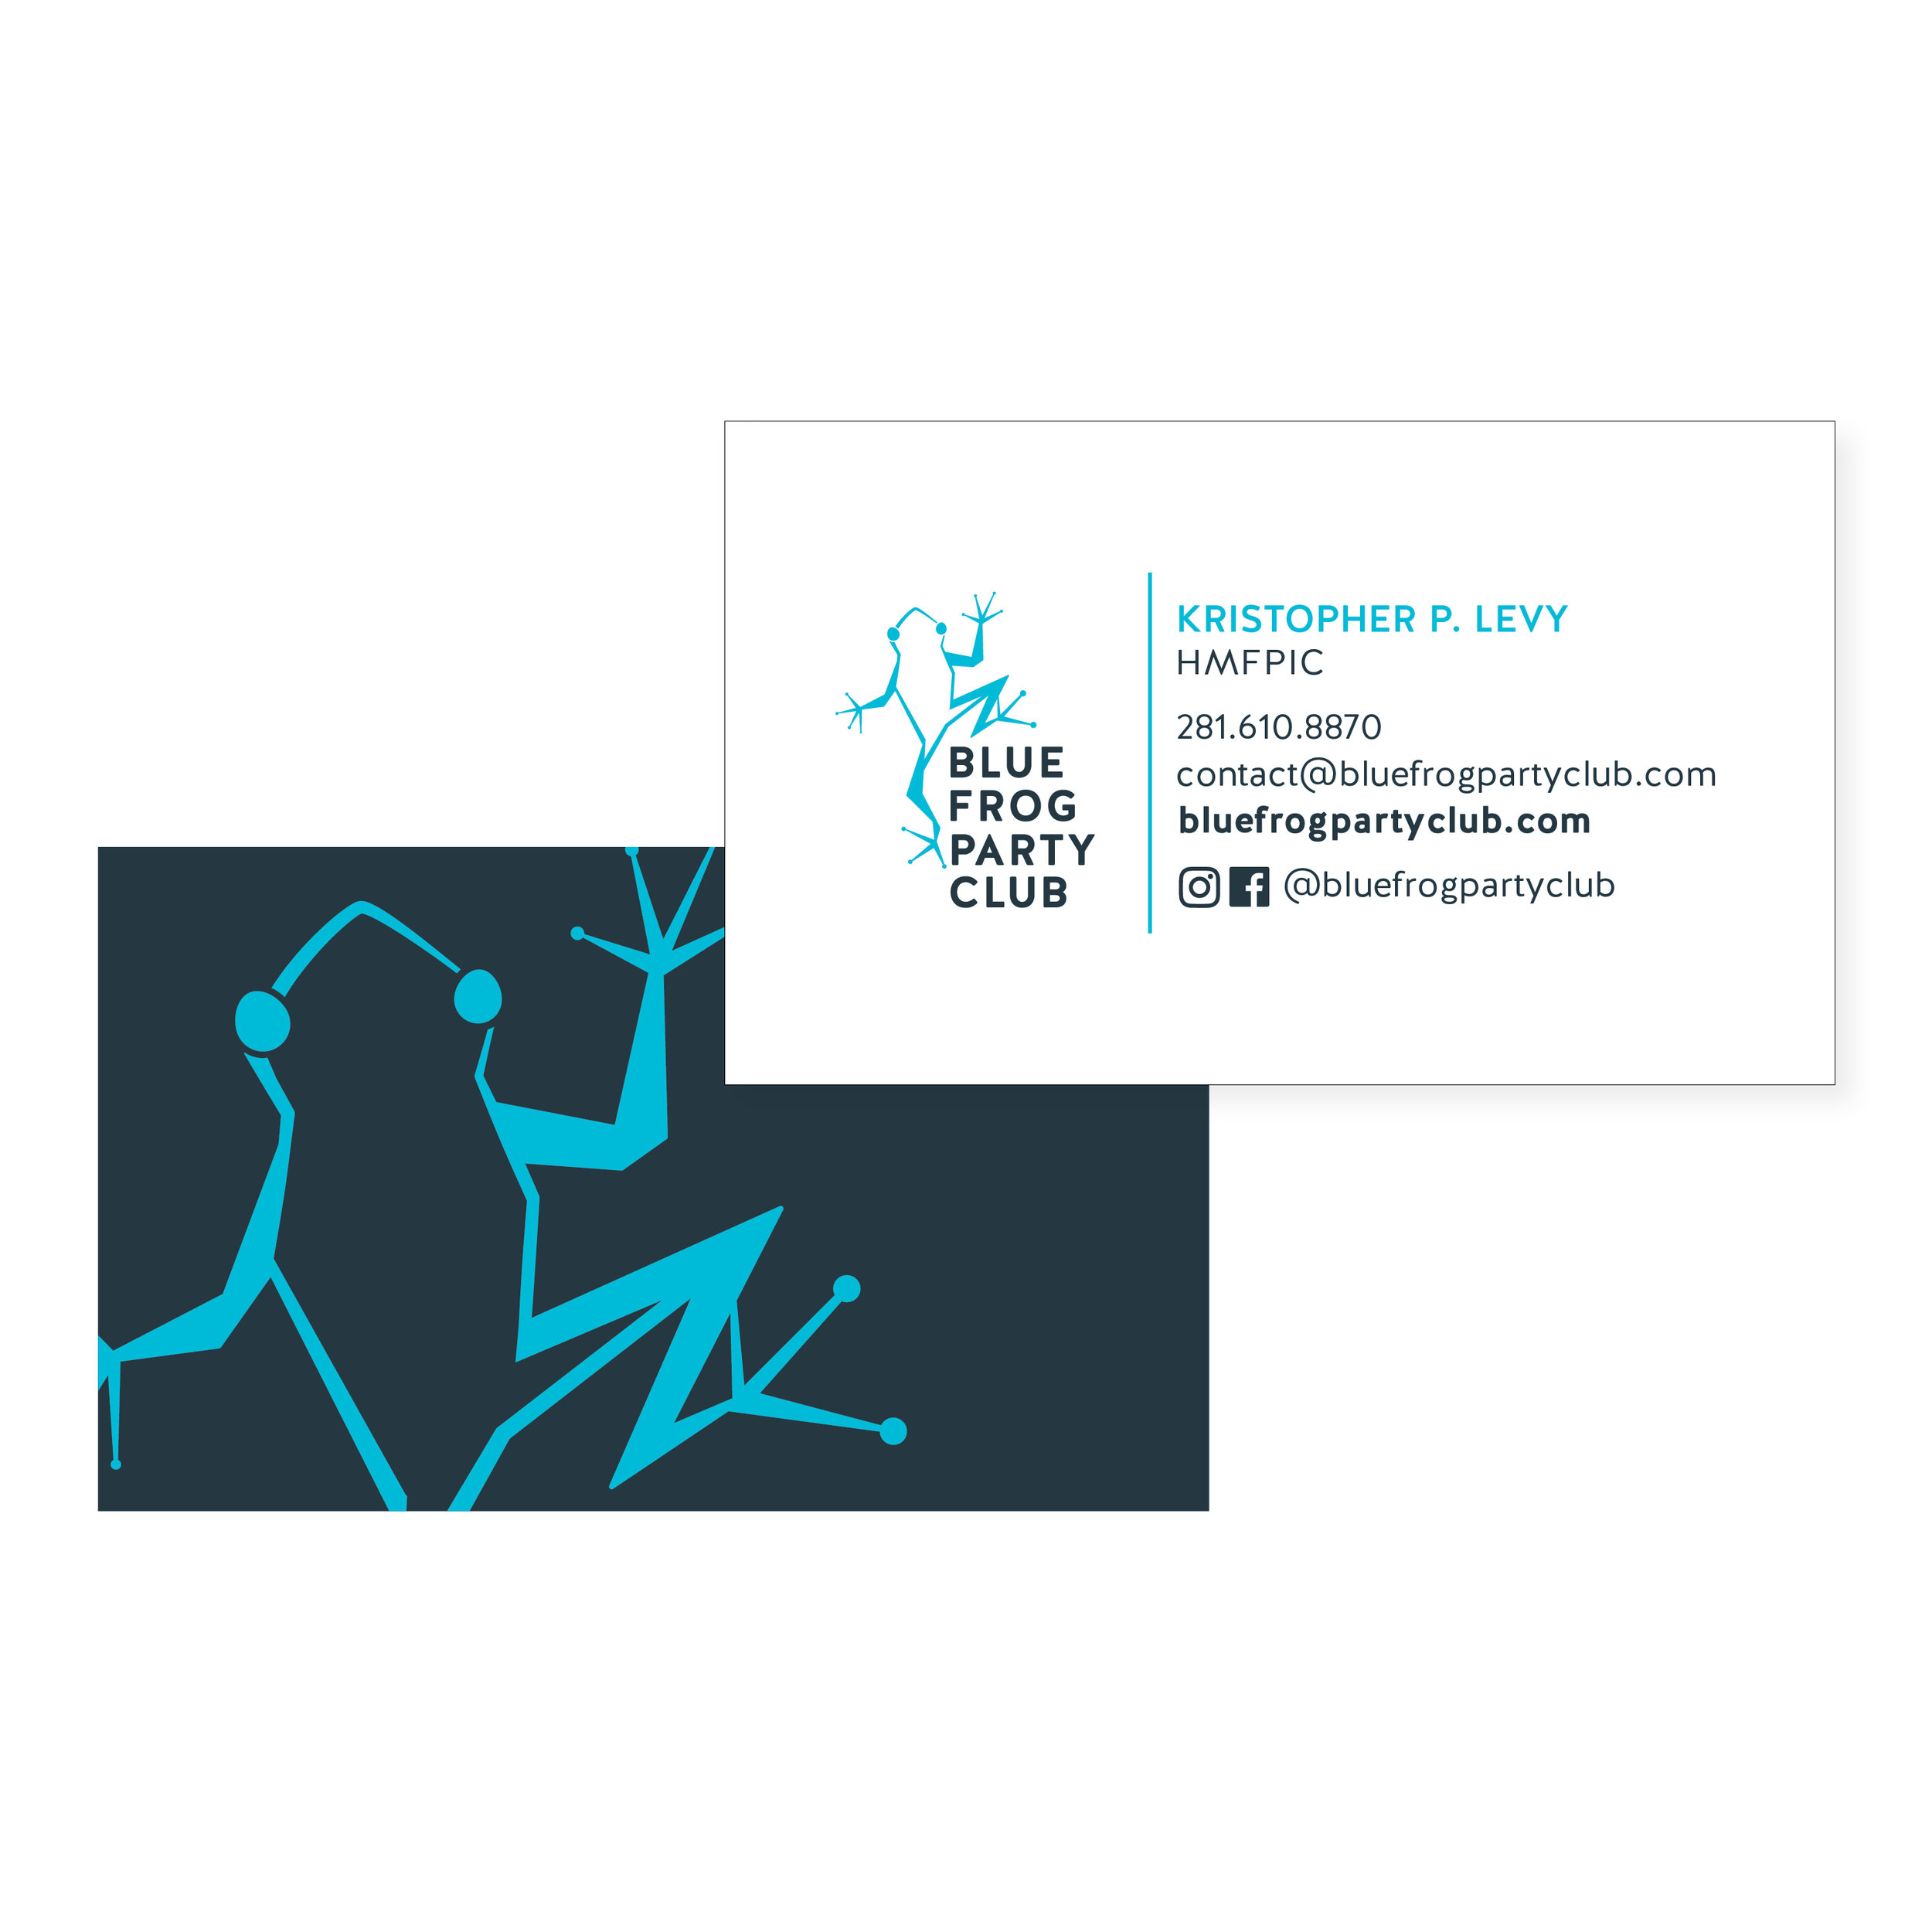 BlueFrogPartyClub2.jpg